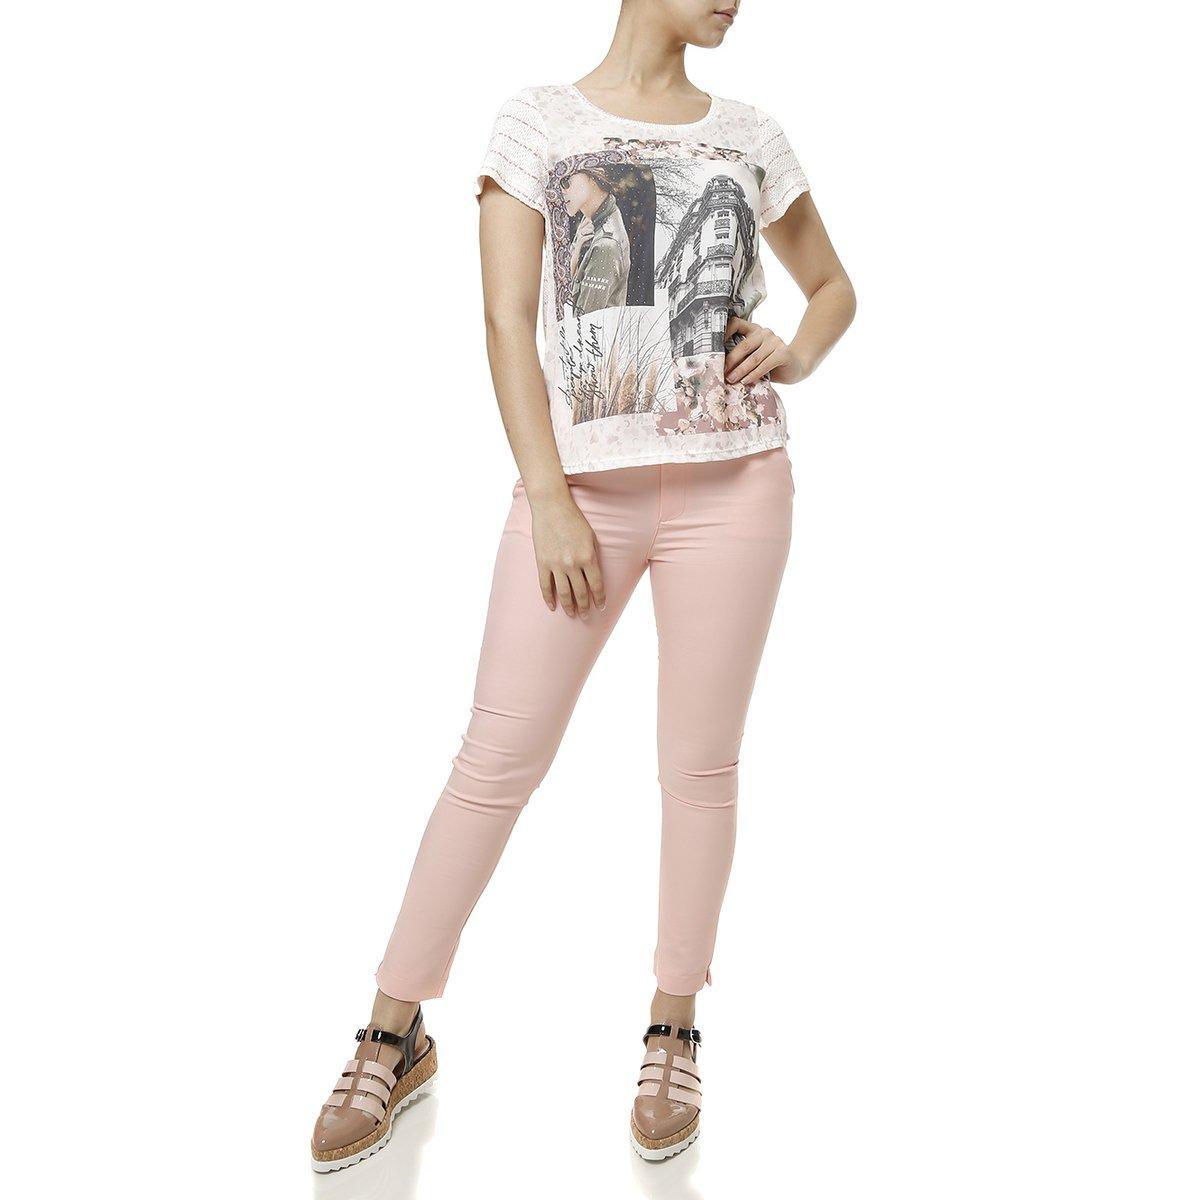 41447c753a Blusa Manga Curta Feminina Autentique - Rosa - Compre Agora